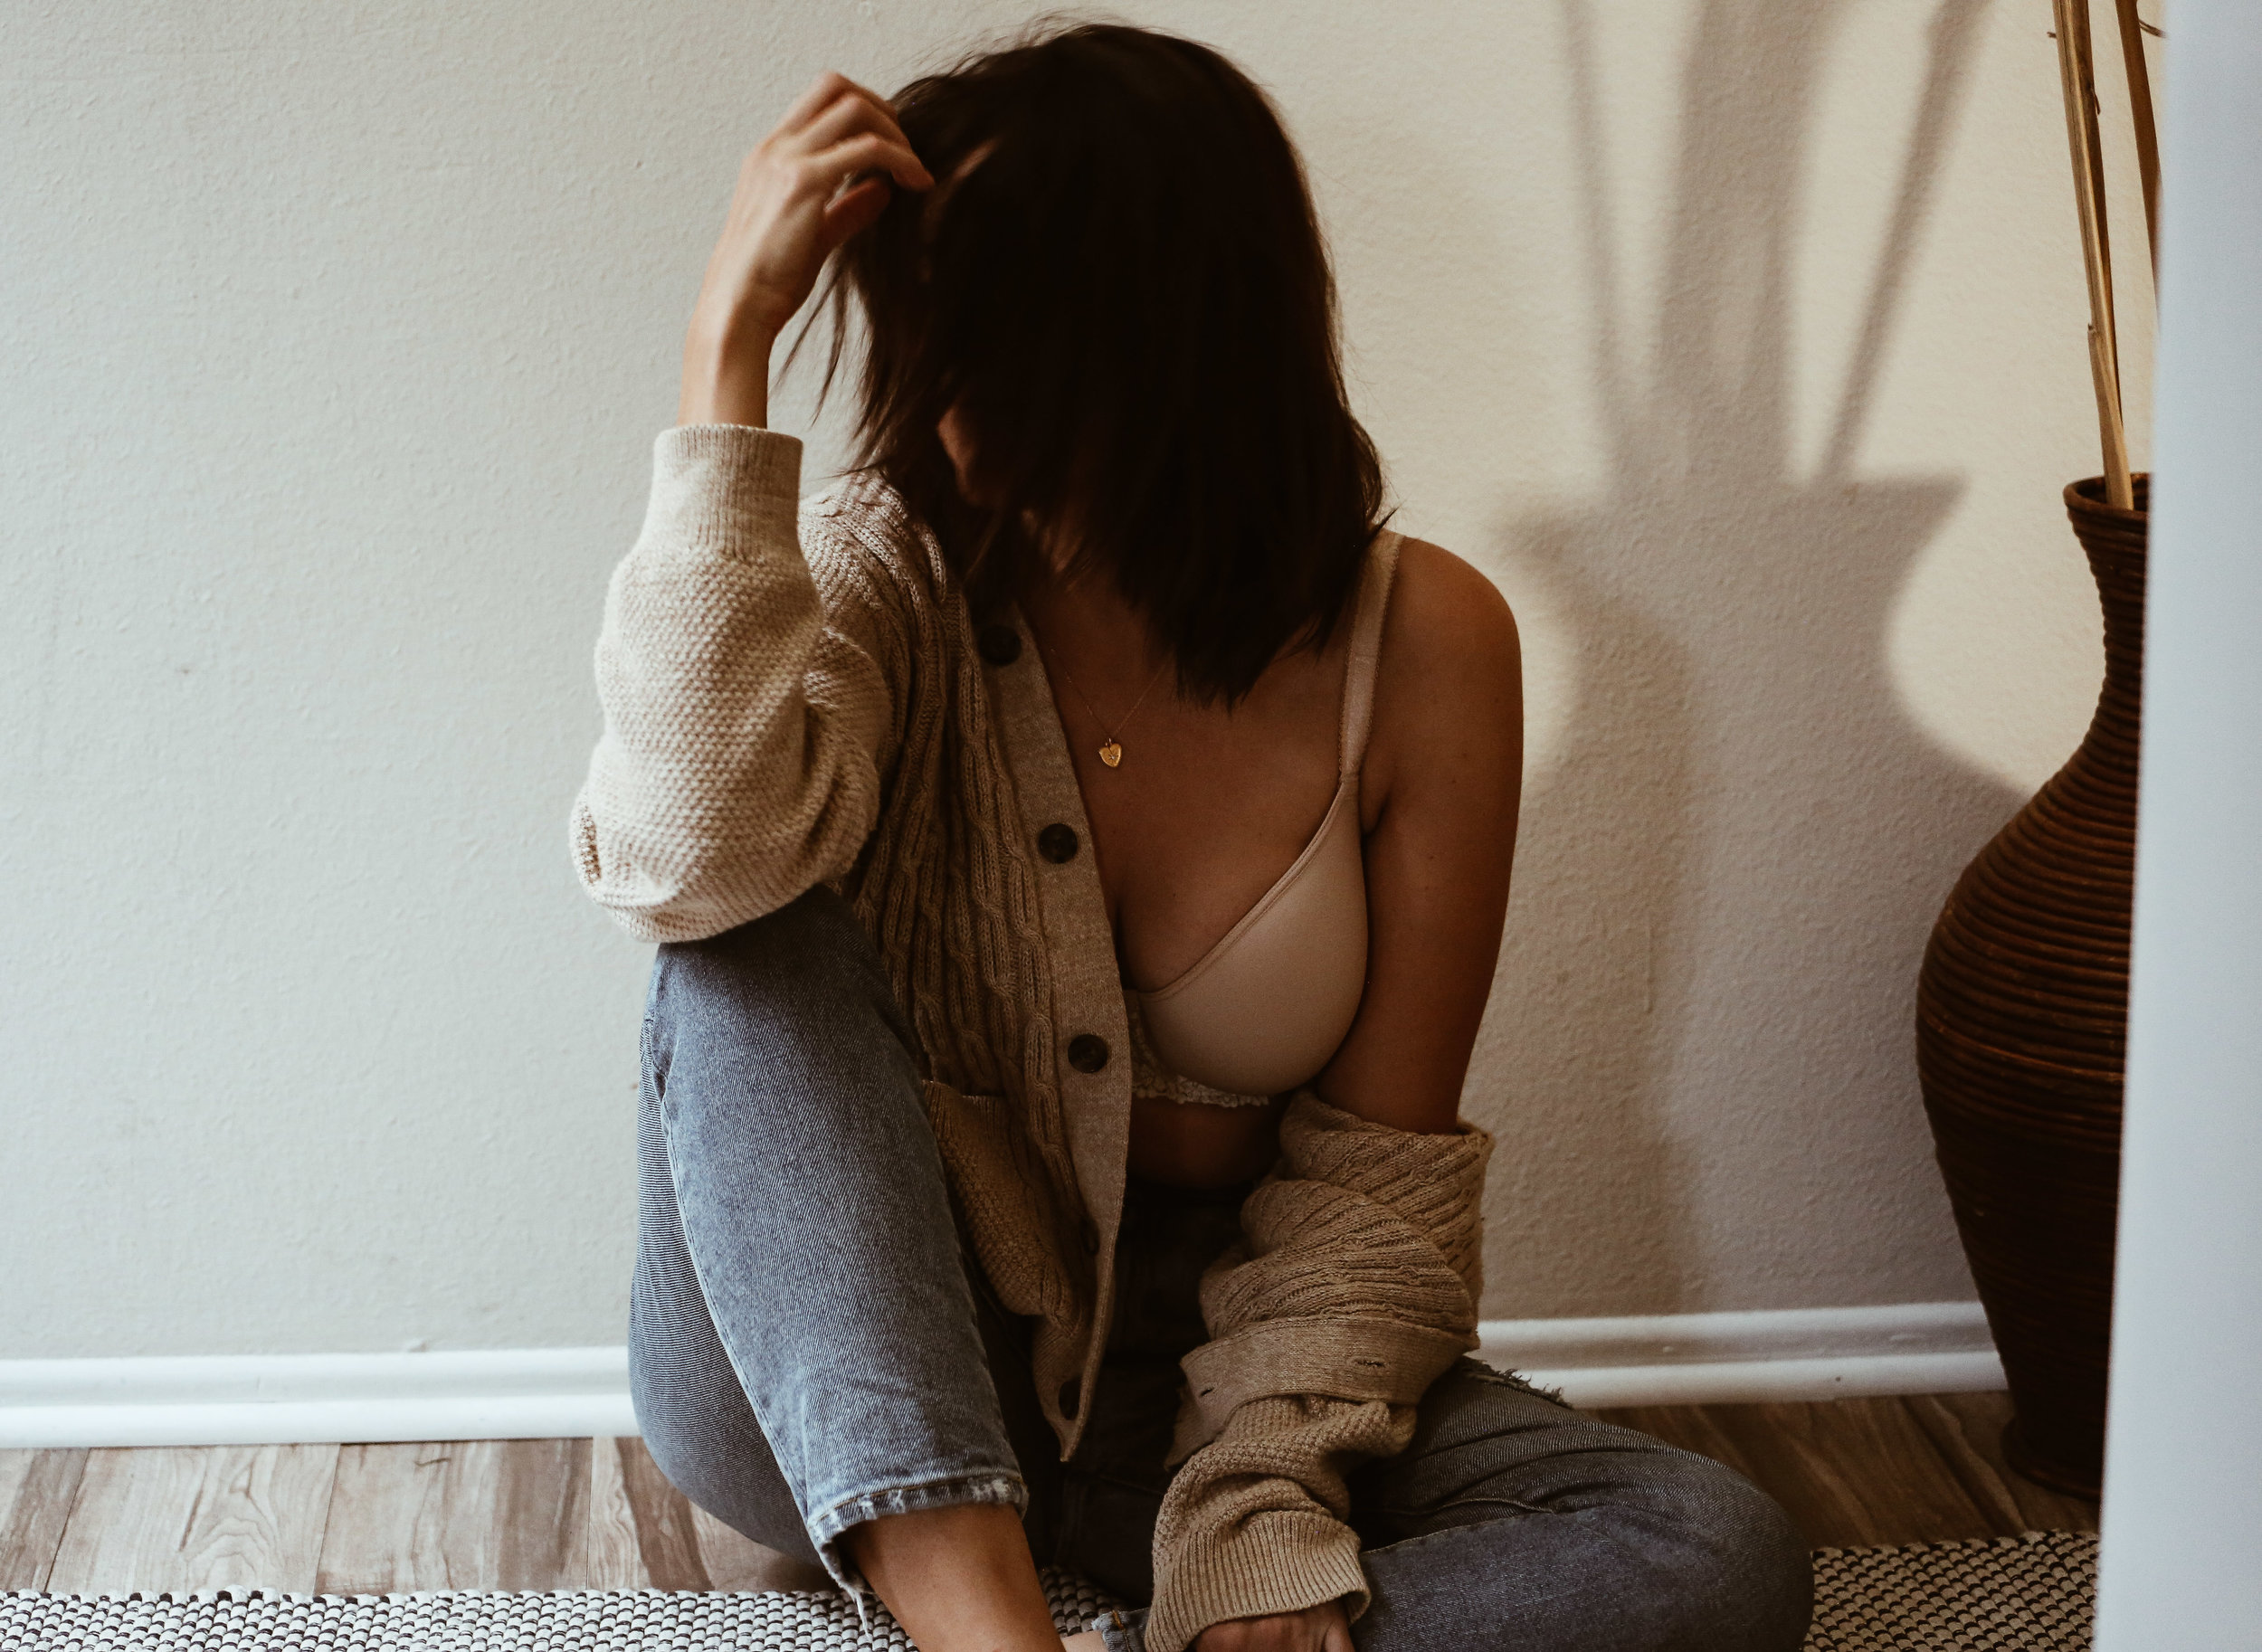 how to find a proper fitting bra-22.jpg